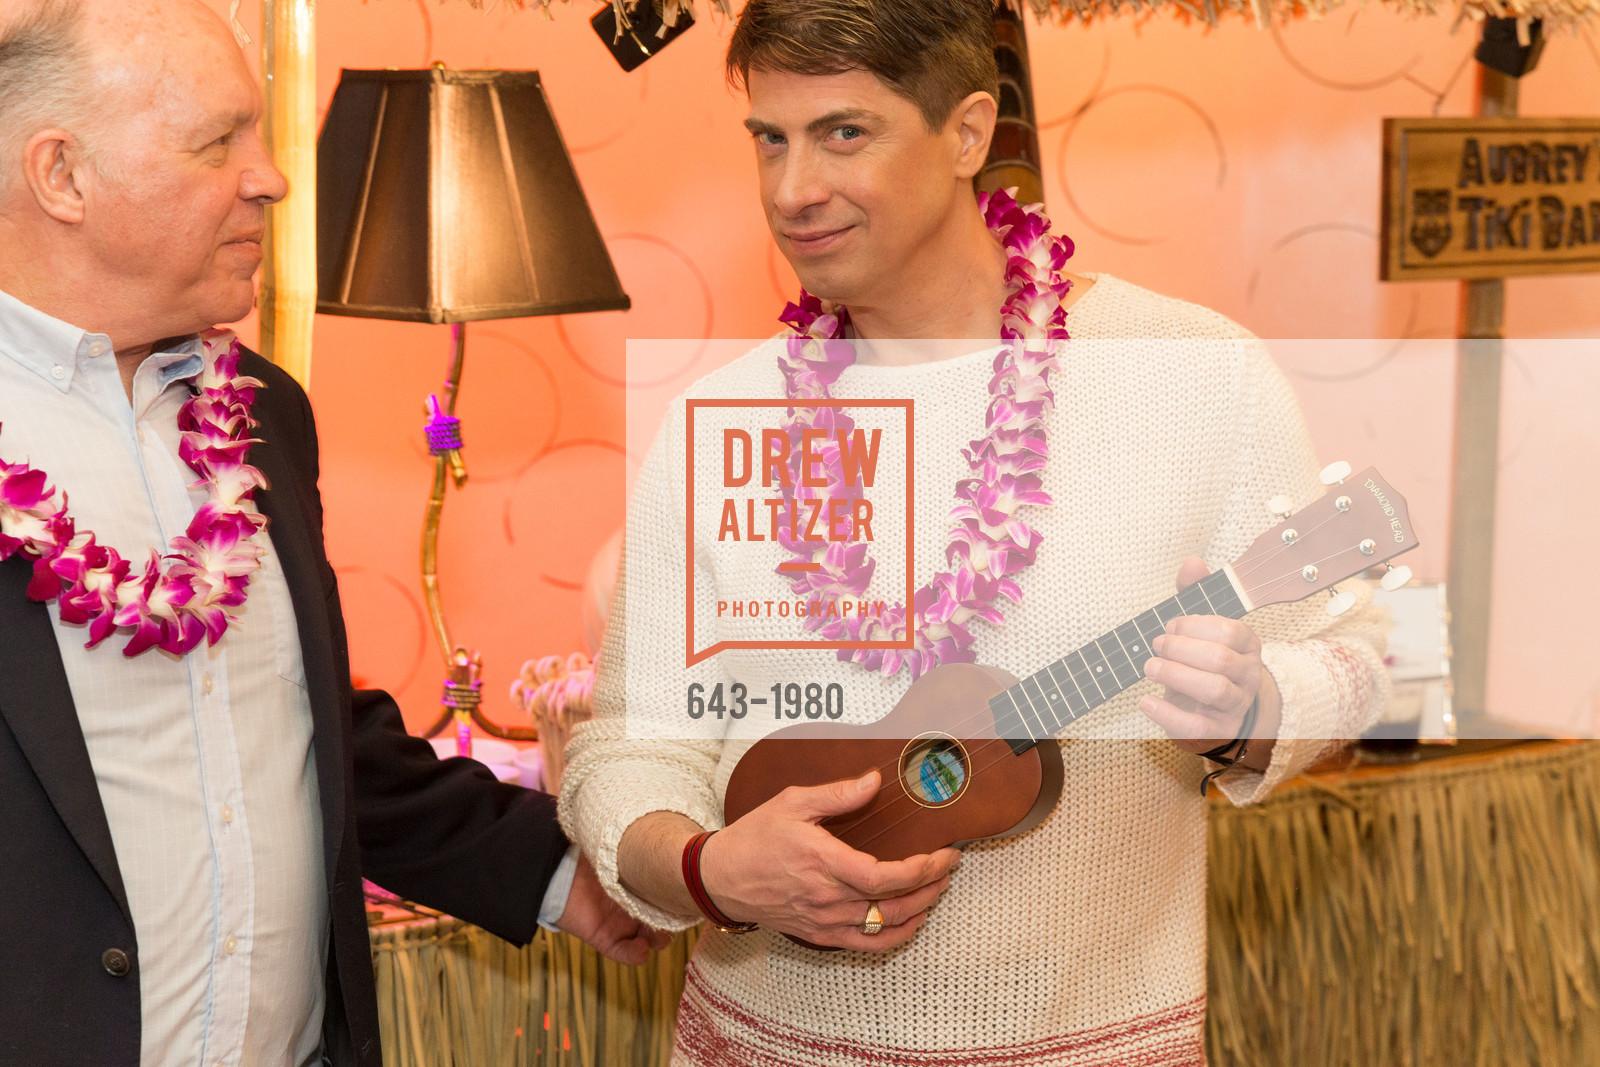 Bill Hales, Aubrey Brewster, Aubrey Brewster's Purely Paradise Birthday Luncheon 2017, Neiman Marcus. 150 Stockton St  SF, California 94108, March 24th, 2017